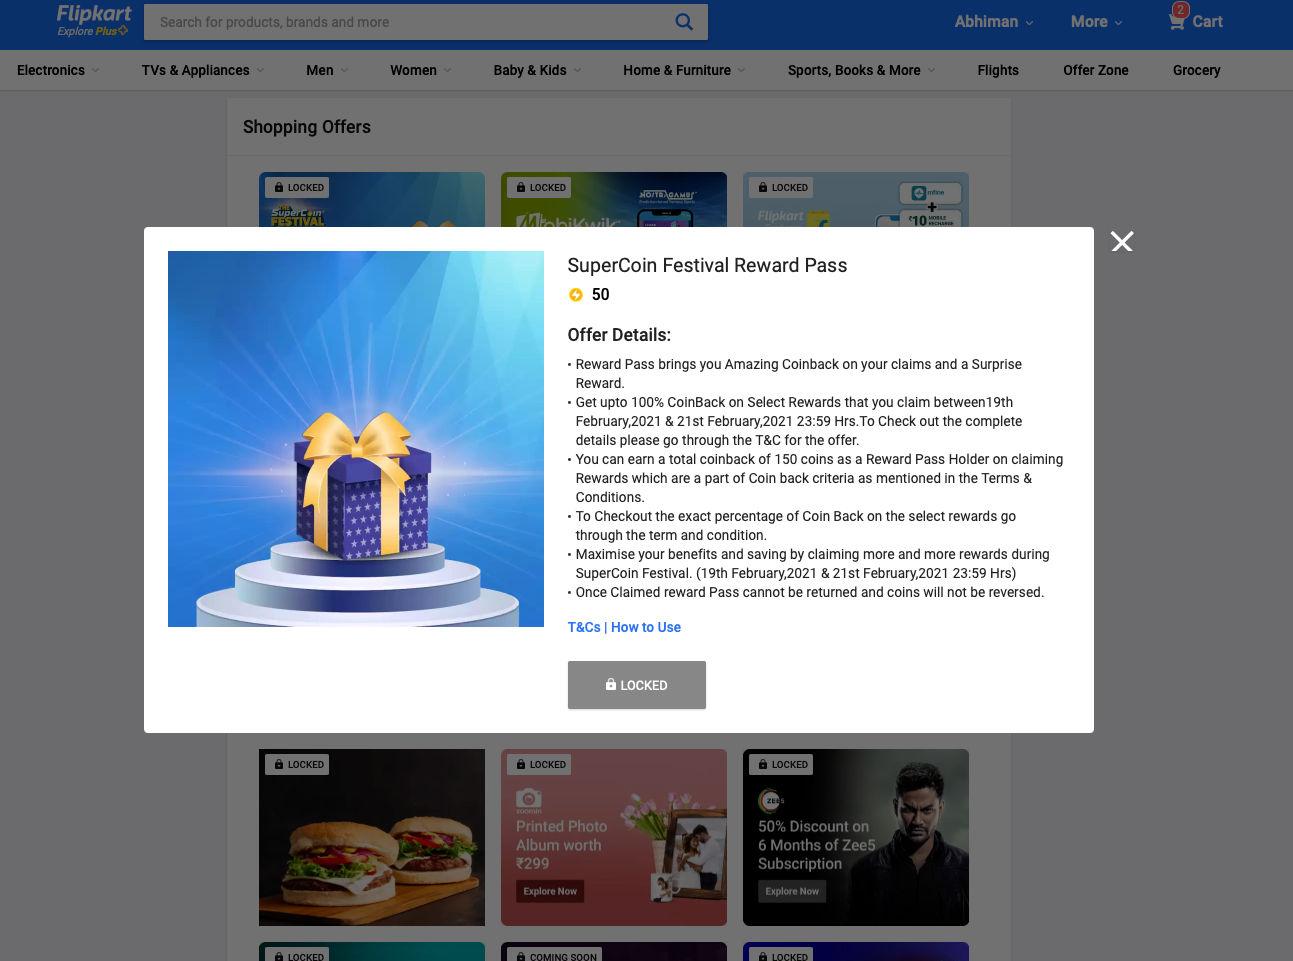 Flipkart Reward Pass offers coin backs on claiming rewards and a surprise reward